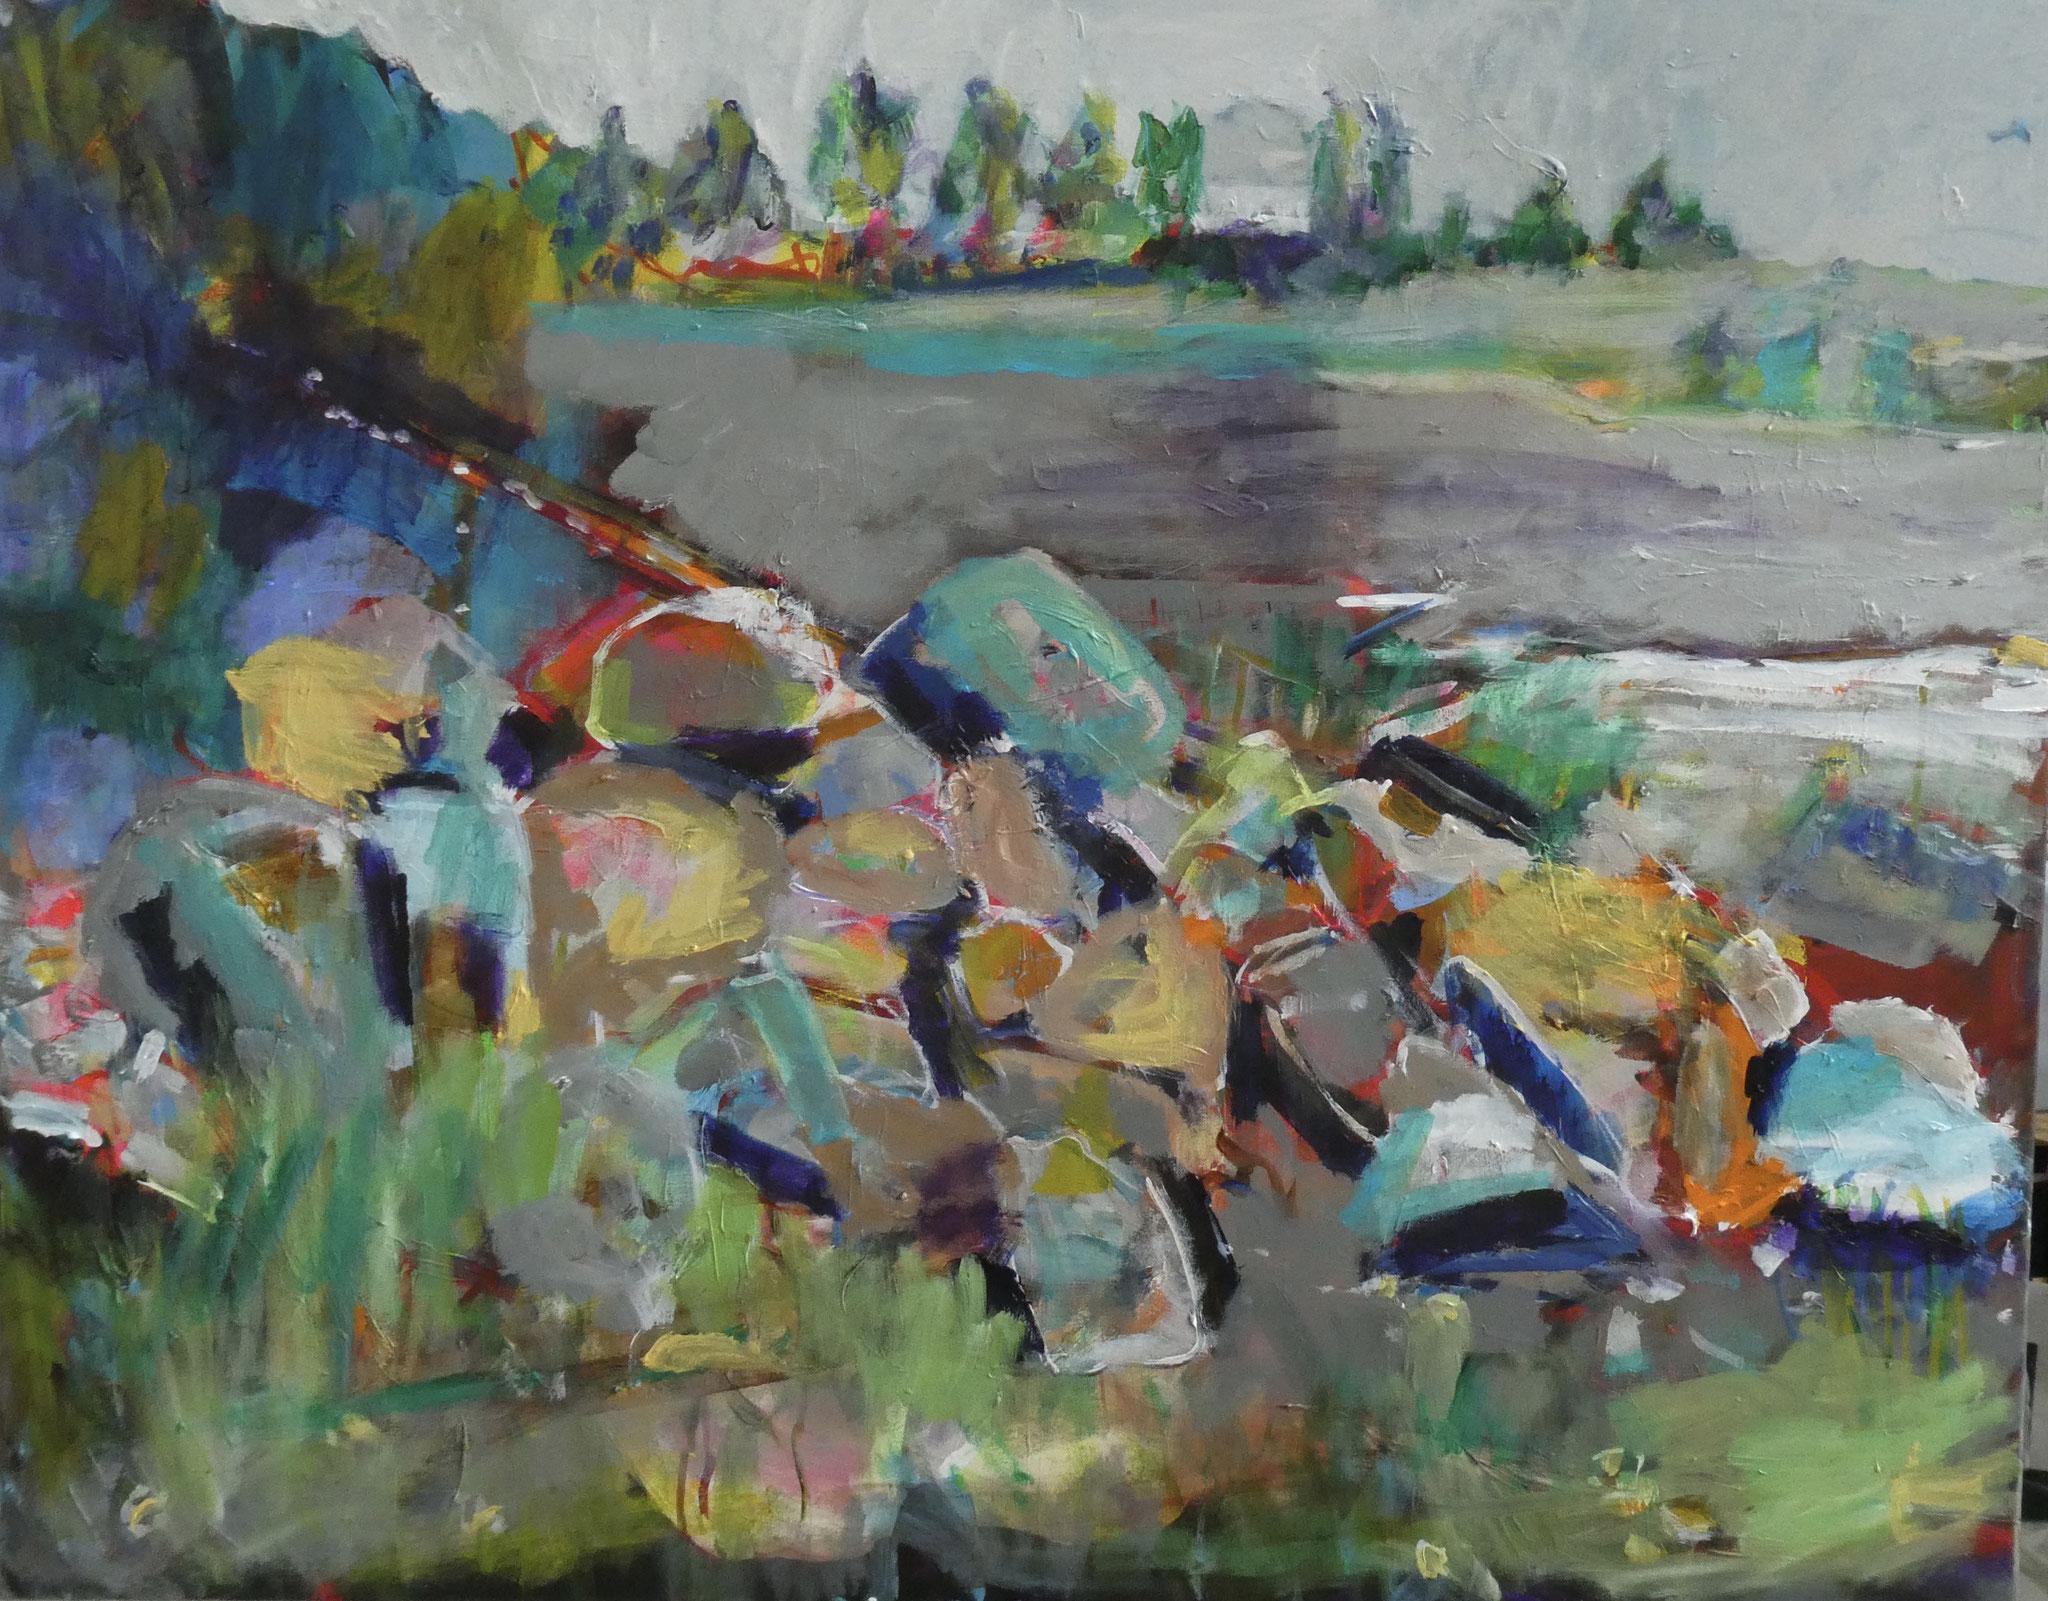 Steine 3, 100x120, acrylic on canvas